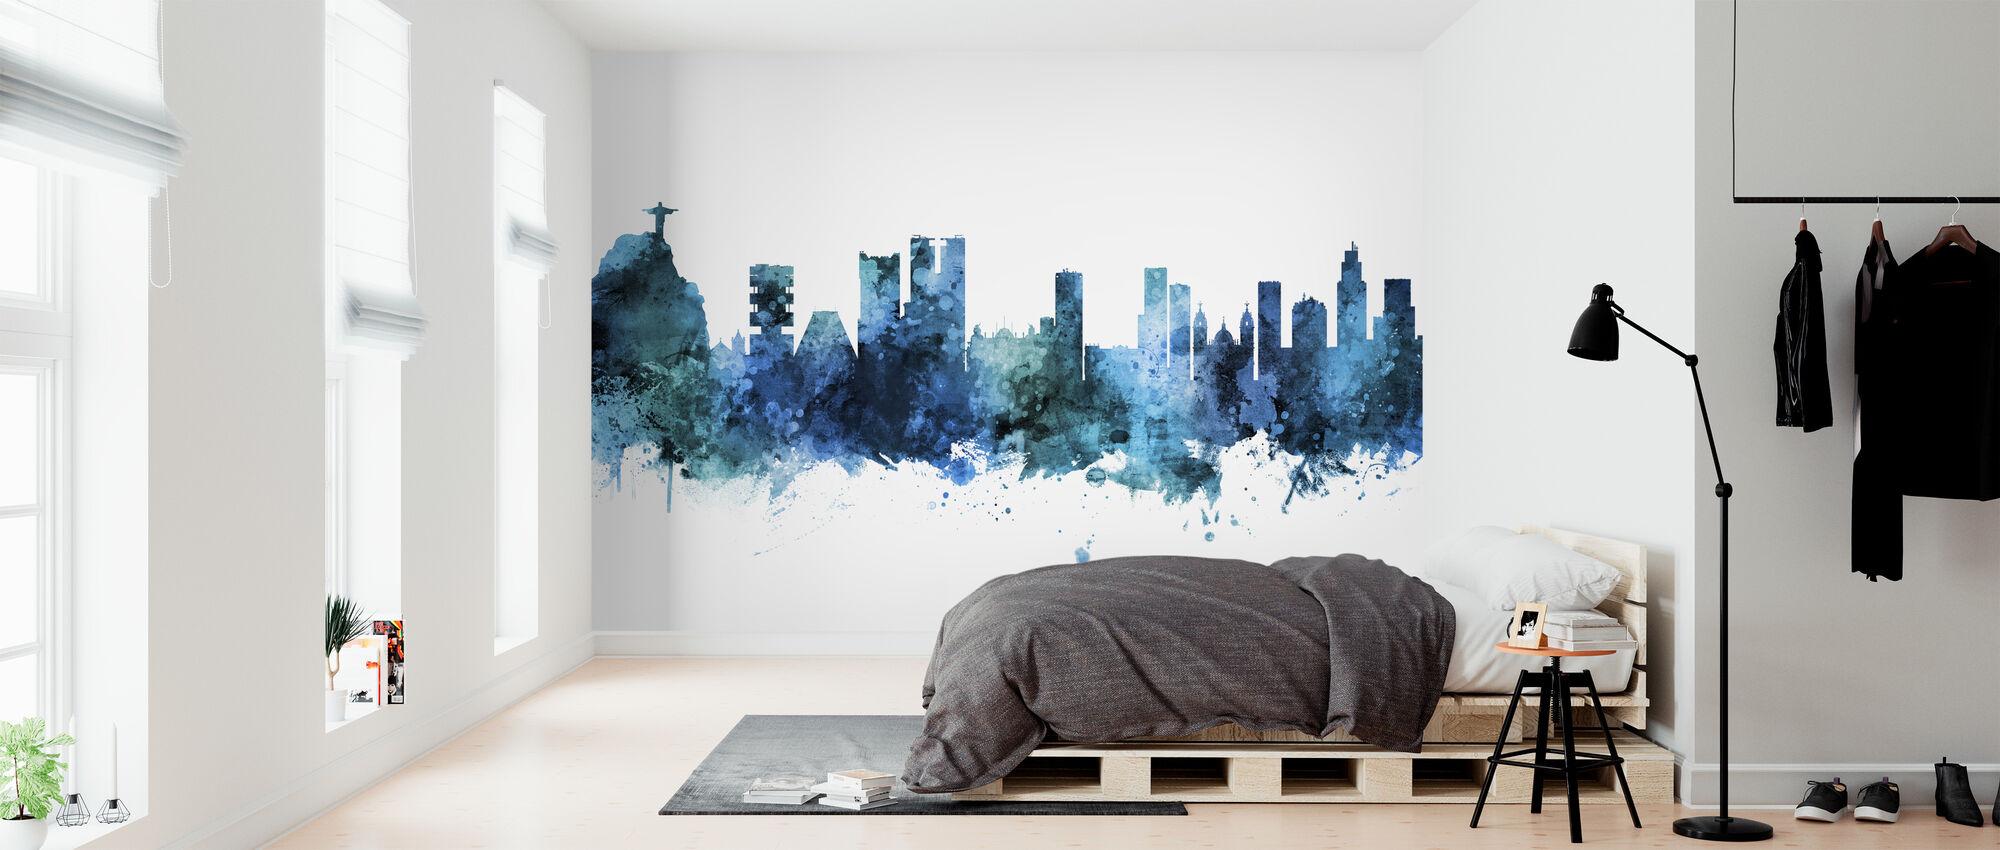 Rio de Janeiro Skyline Brazil - Papier peint - Chambre